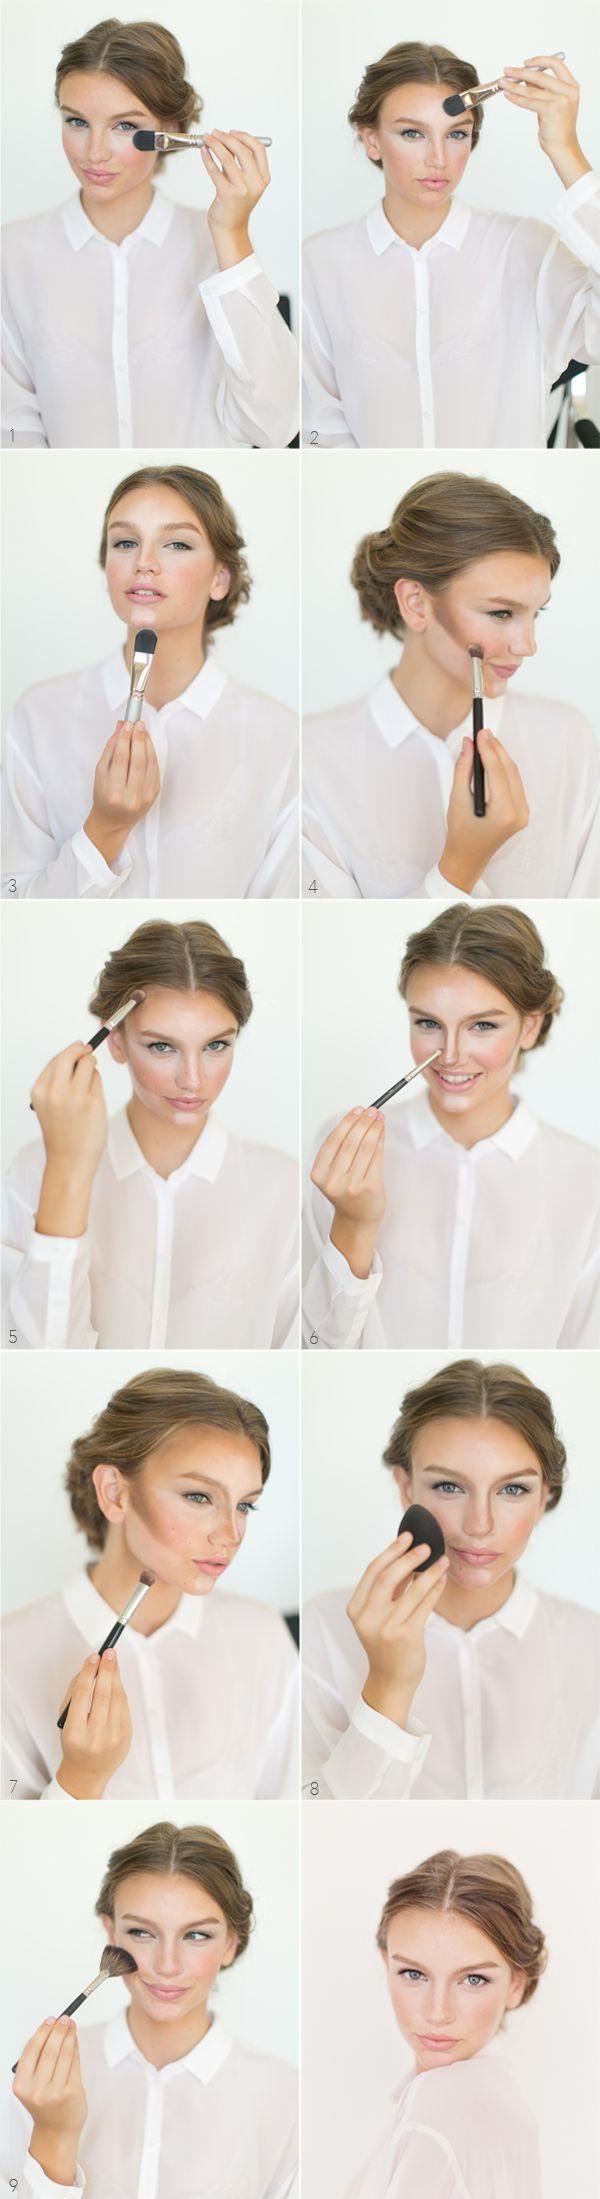 MODbeauty: Natural Glamorous Wedding Makeup tutorial - Photographer: Bryce Covey...